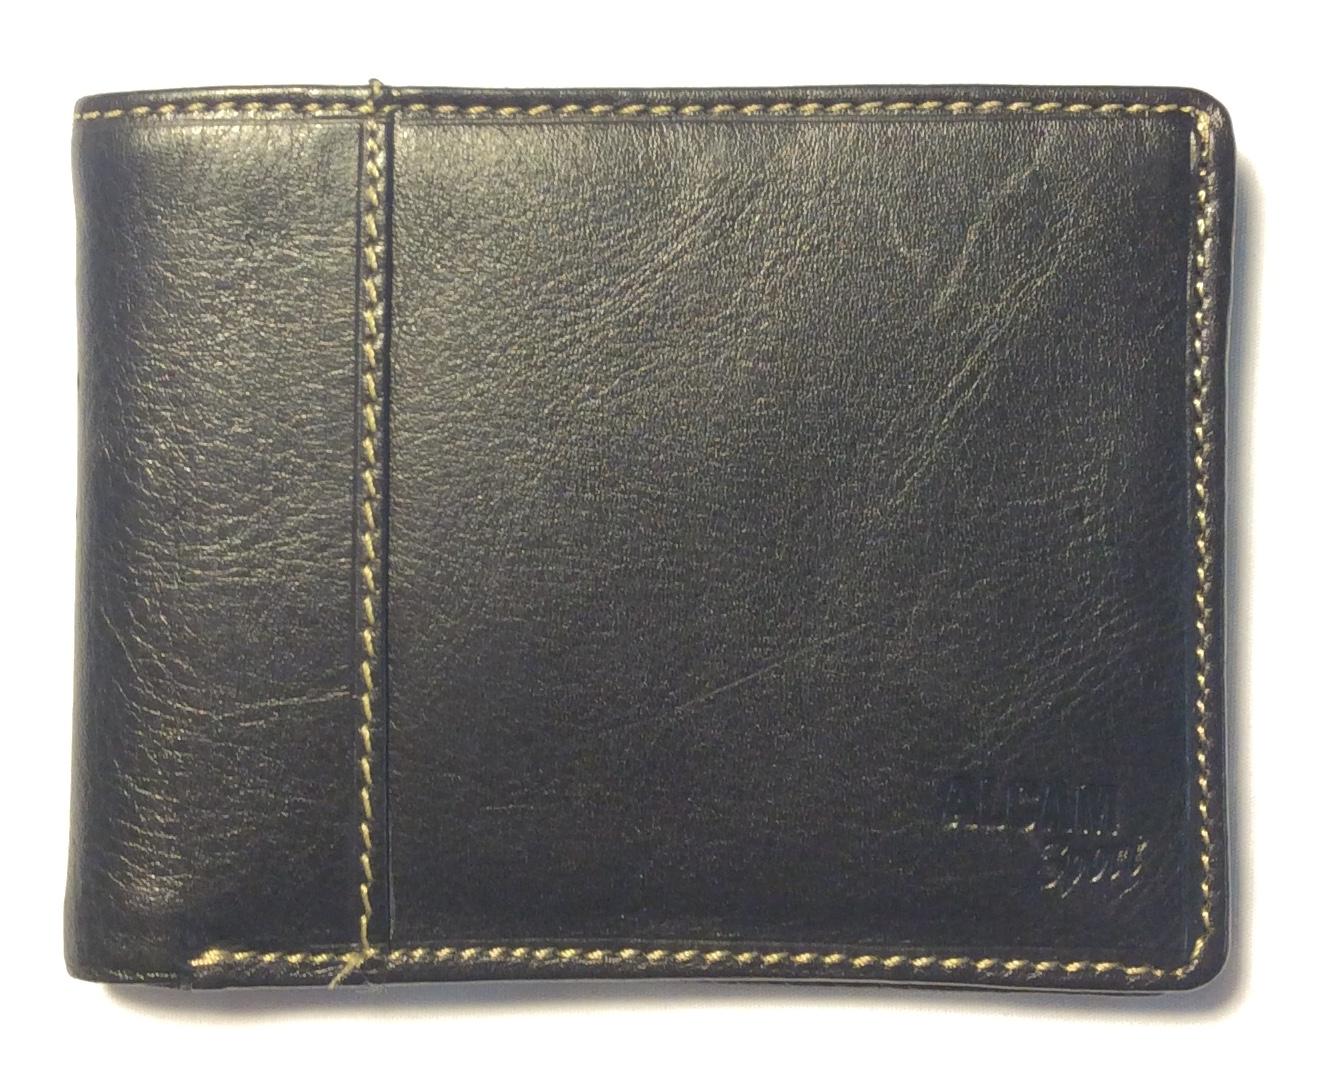 Black leather with beige medium